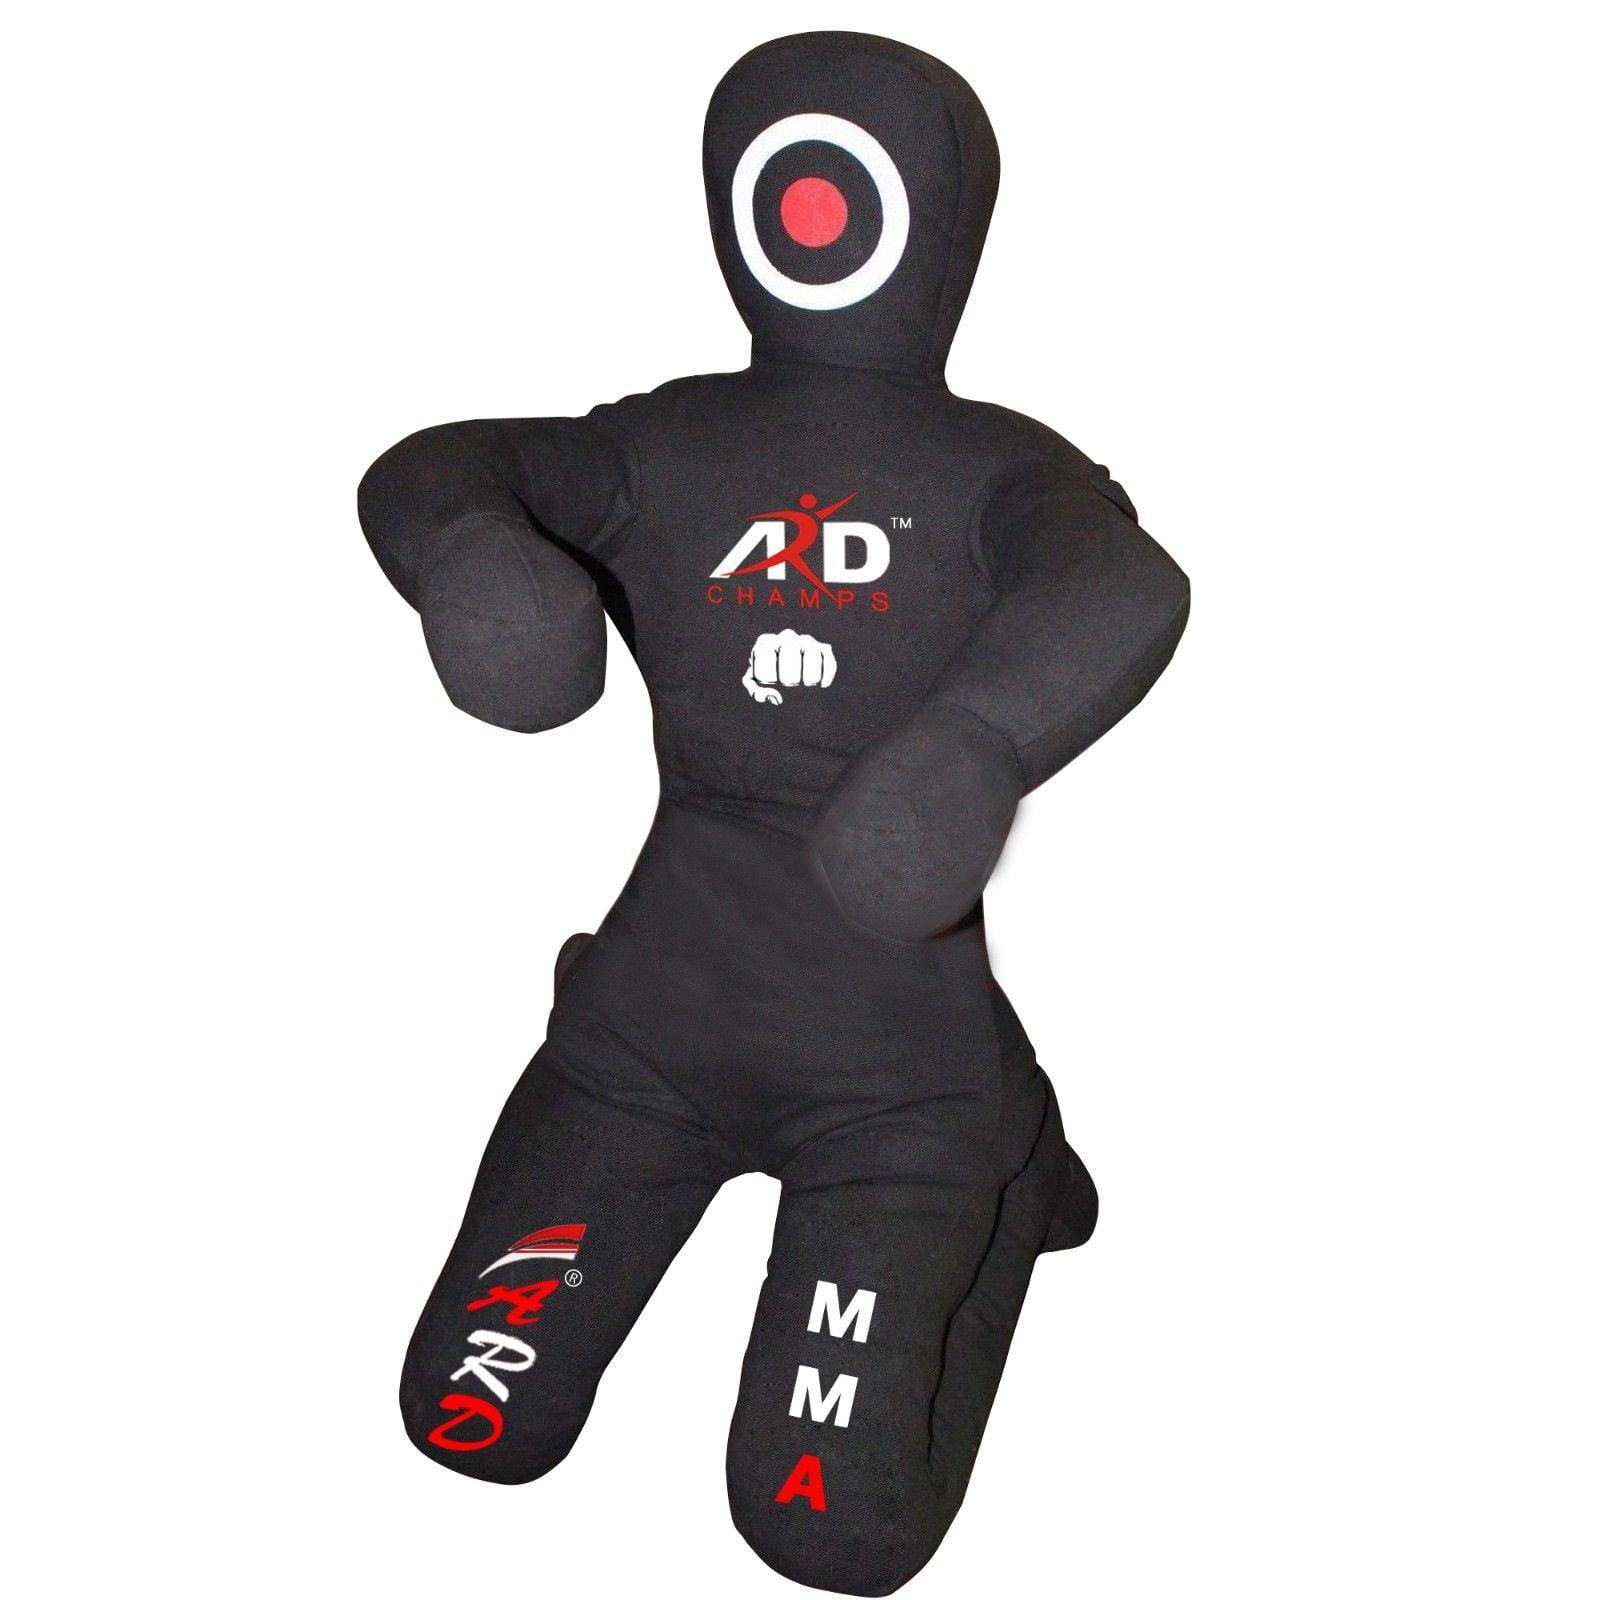 ARD CHAMPS Brazilian Jiu Jitsu Grappling Canvas Kneeling Dummy MMA Boxing Wrestling, Color Black, Size 6'Feet by